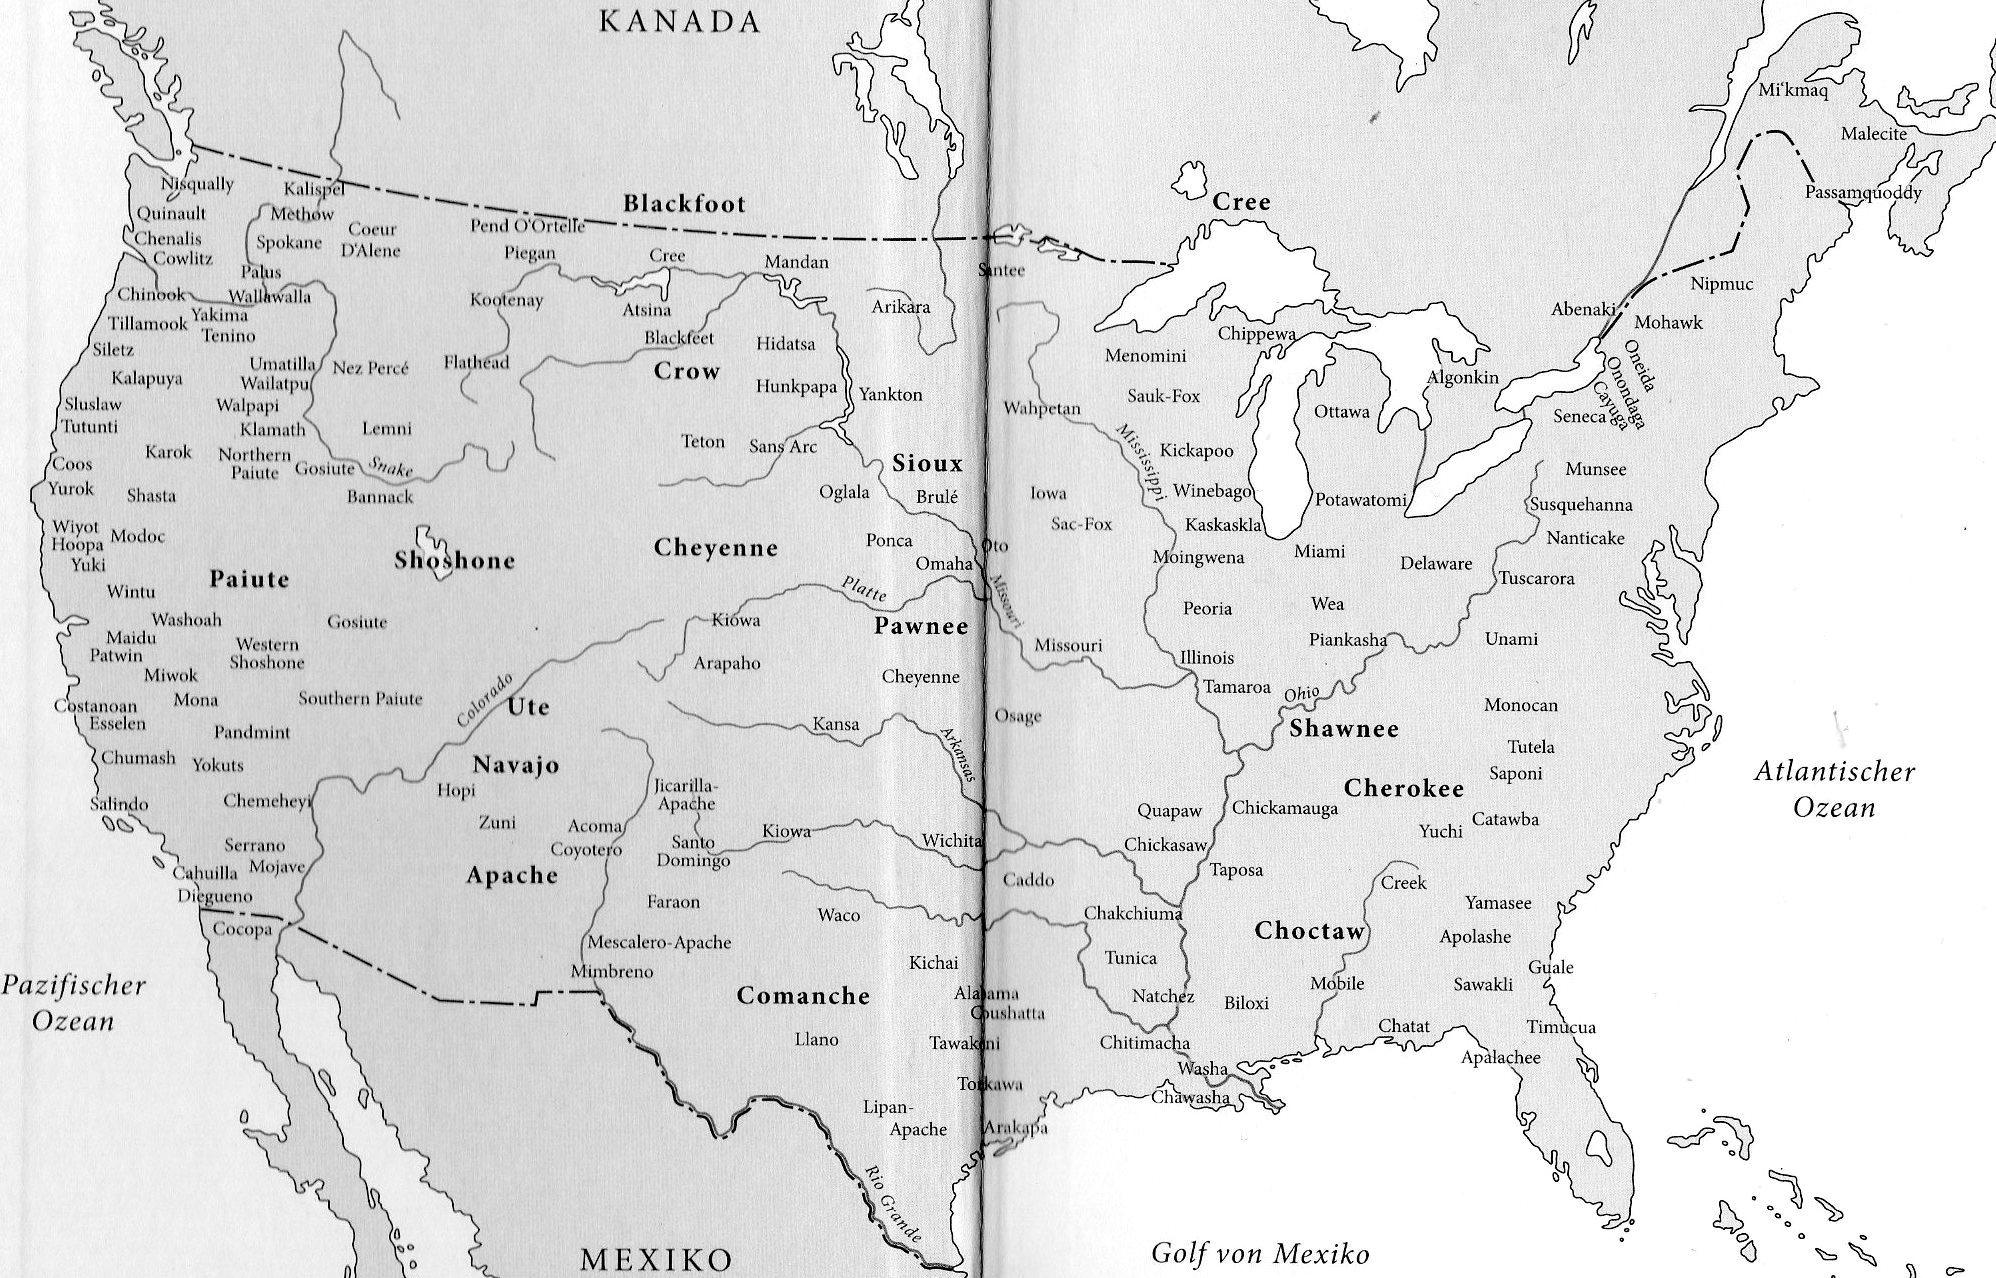 Usa Karte Ohne Staaten.Globale Allmende Indianer Der Usa